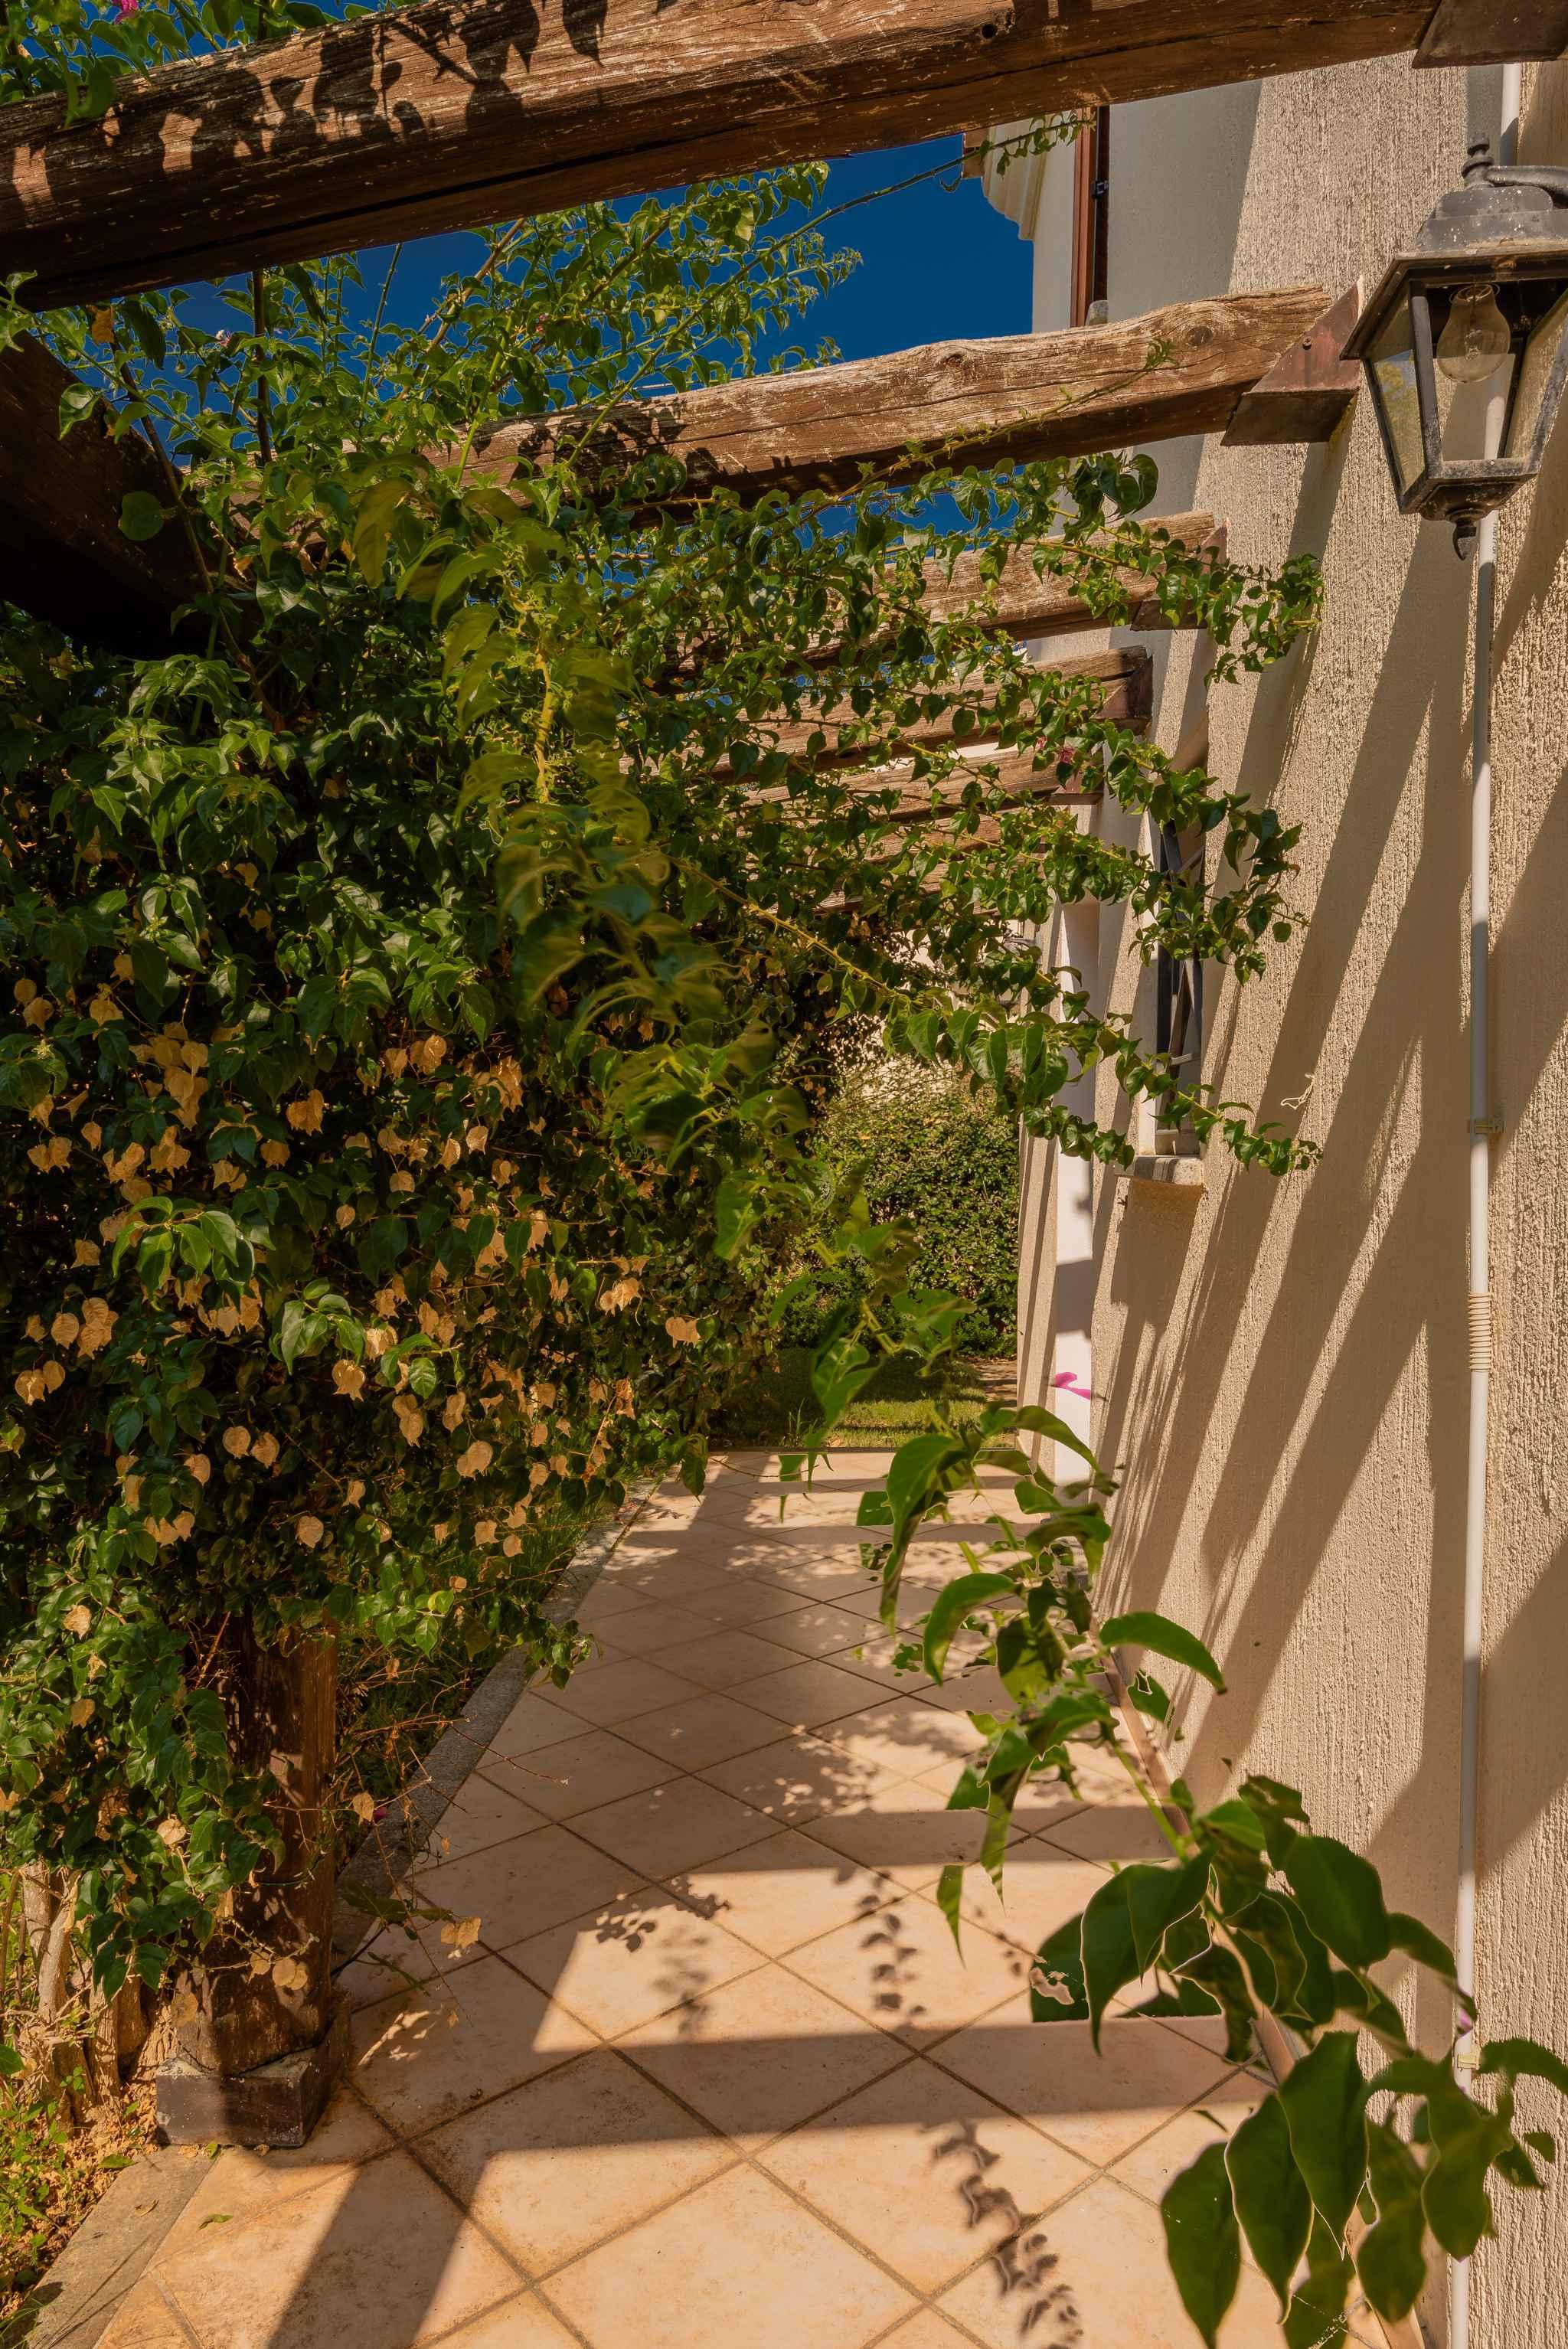 Ferienwohnung Appartamento 6 persone (2853261), Budoni, Olbia-Tempio, Sardinien, Italien, Bild 2